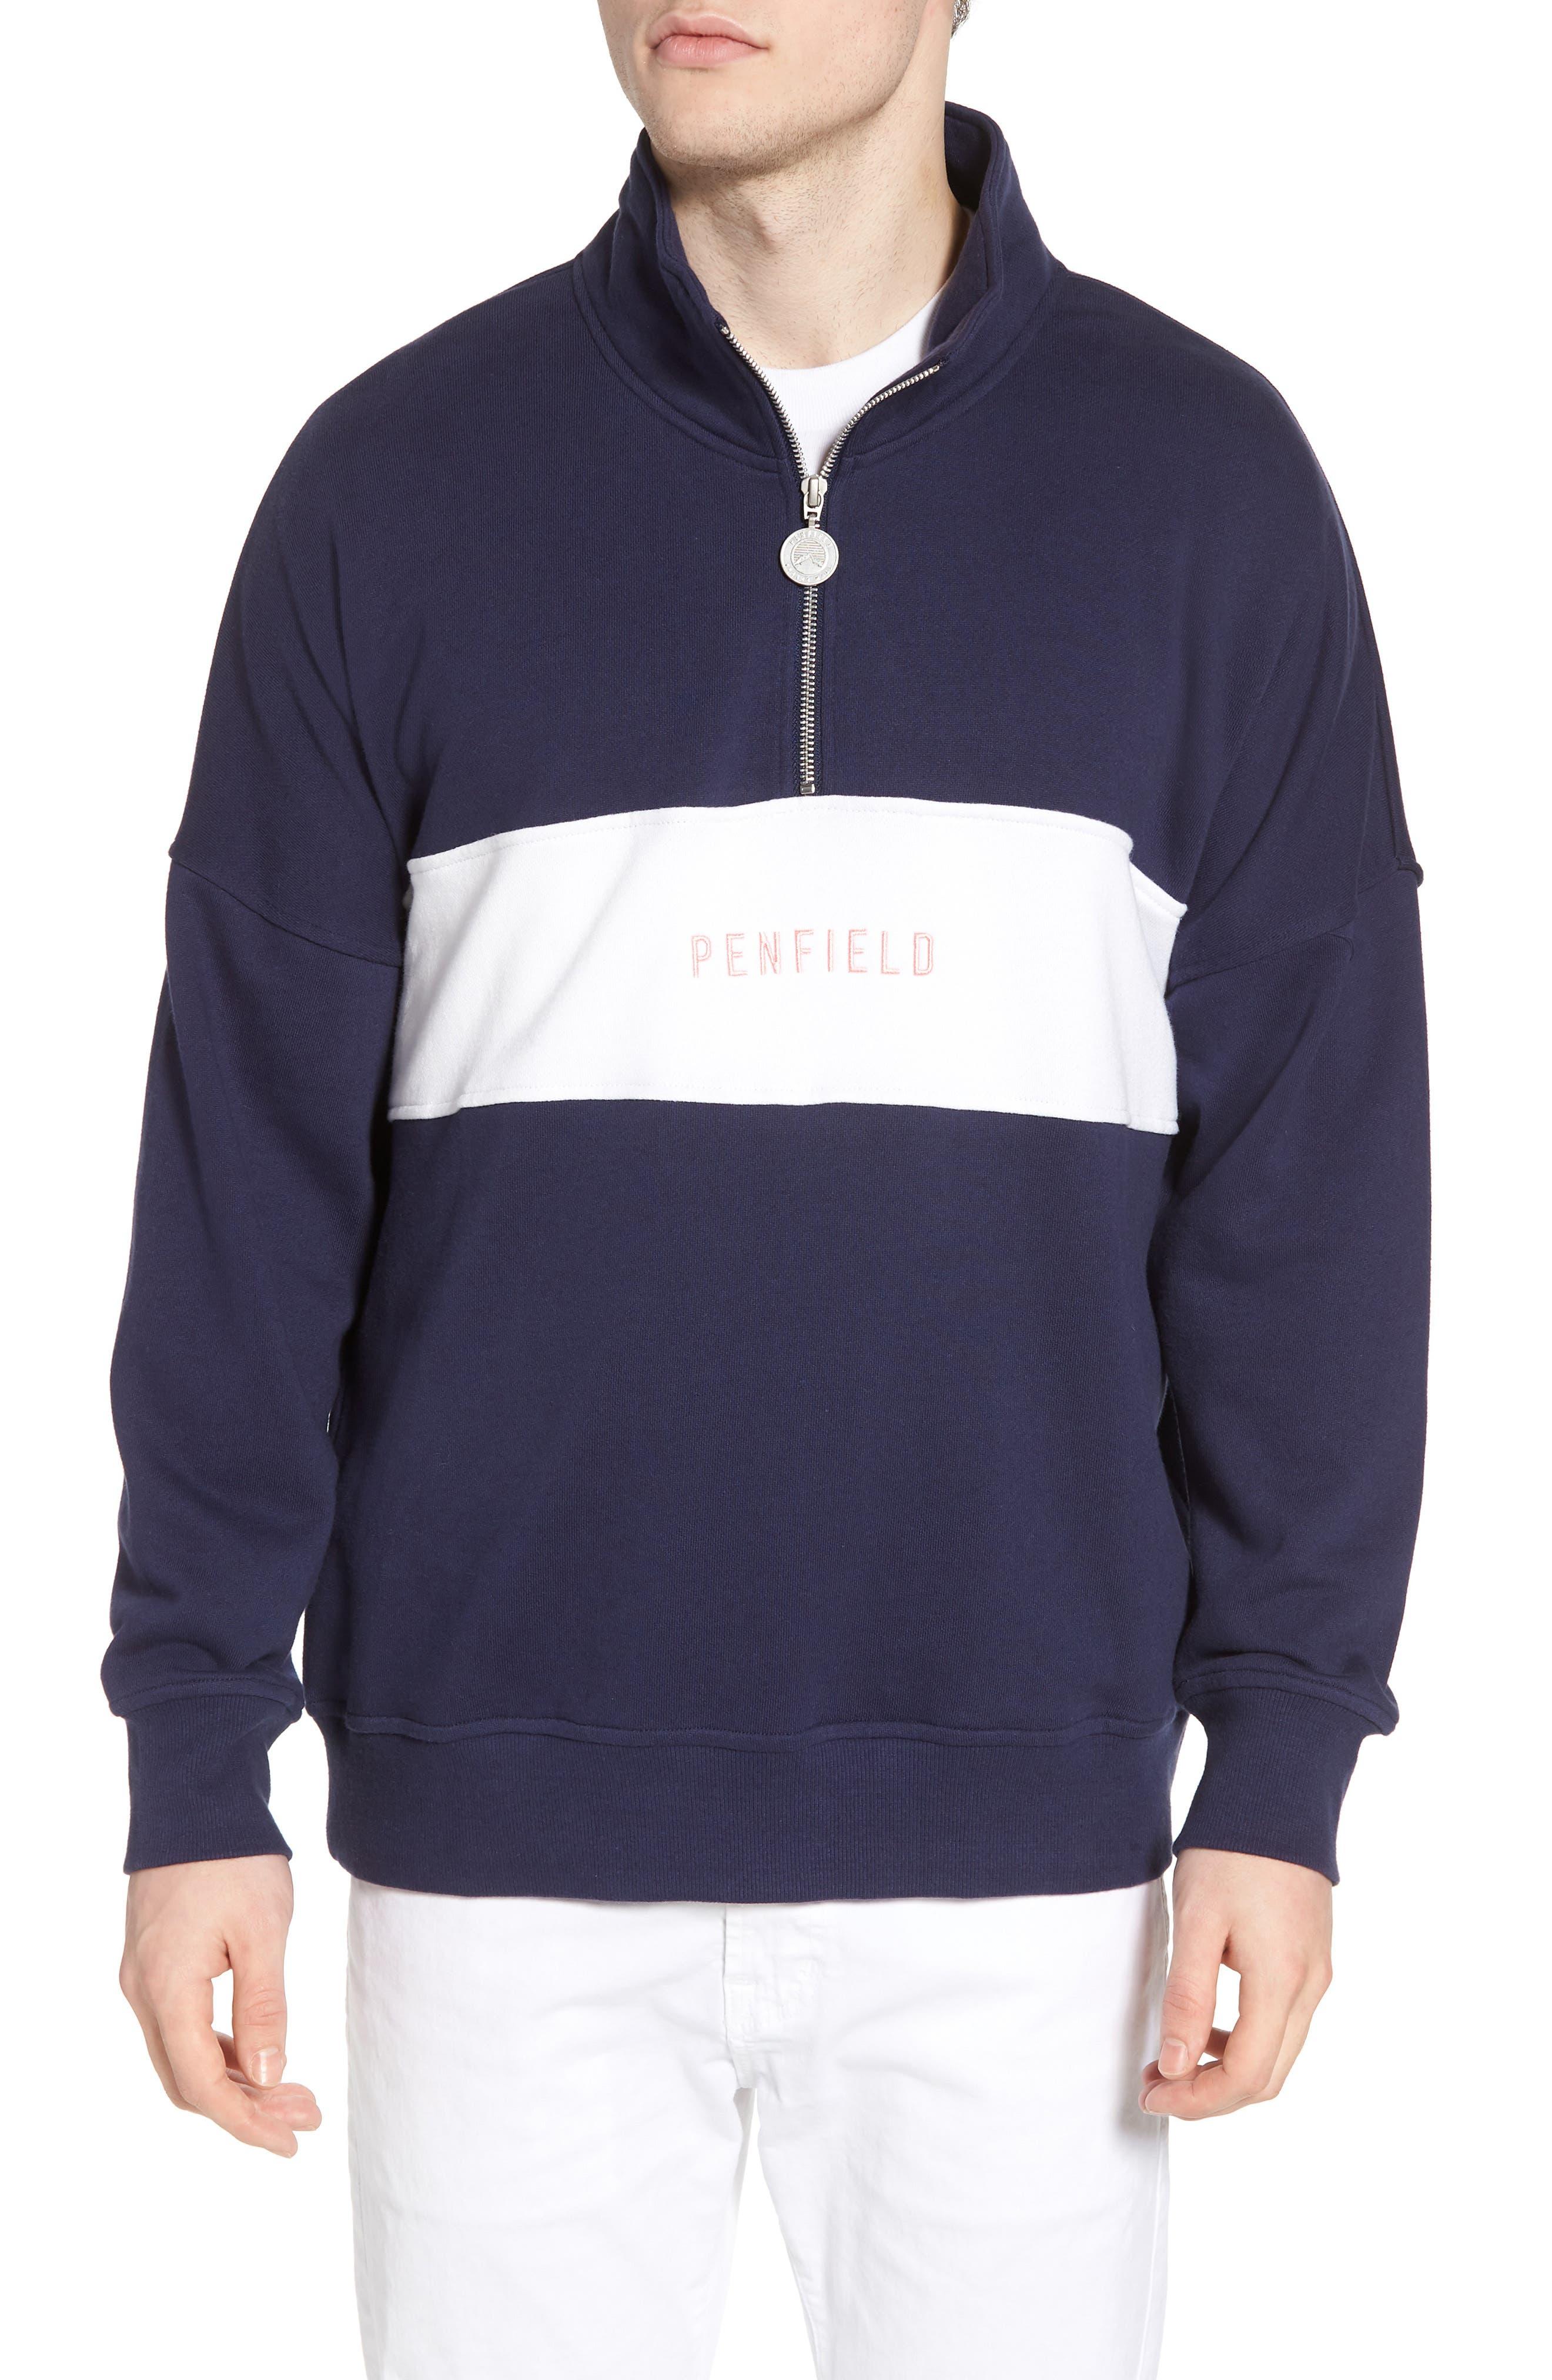 Hosmer Sweatshirt,                         Main,                         color, 400